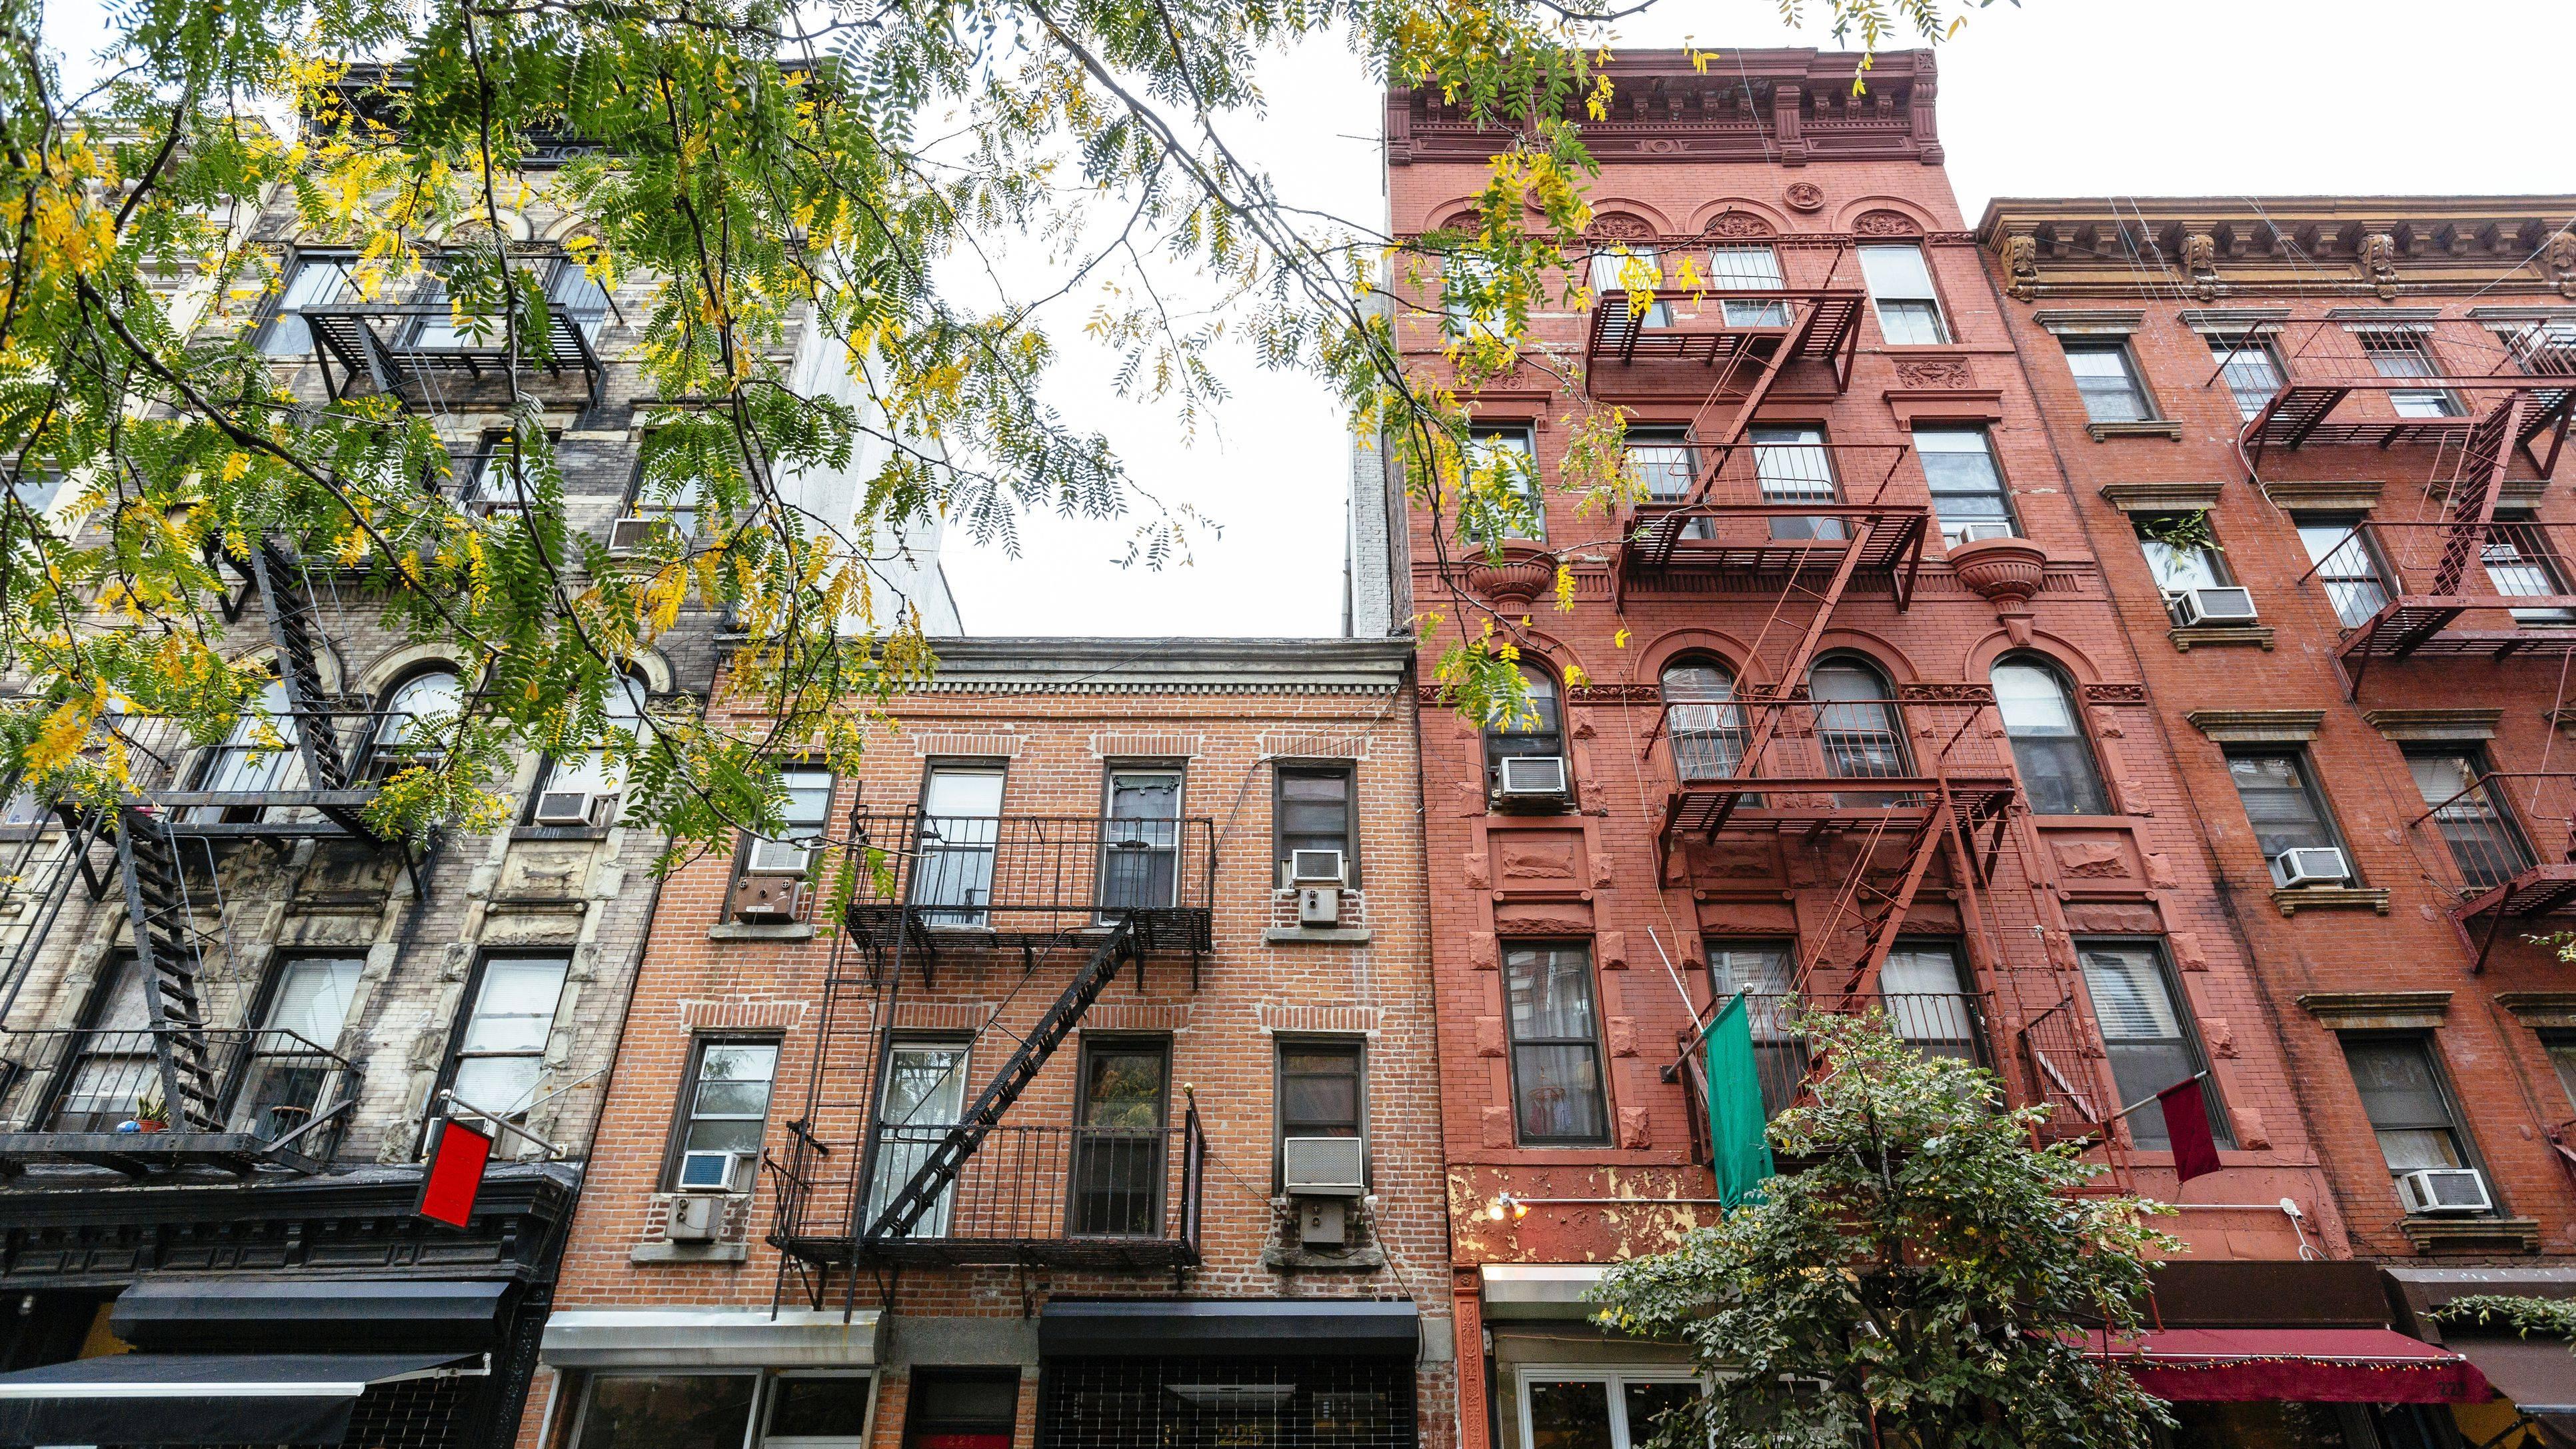 architecture in soho neighborhood new york city usa 5b74c6ecc9e77c0057eec18f